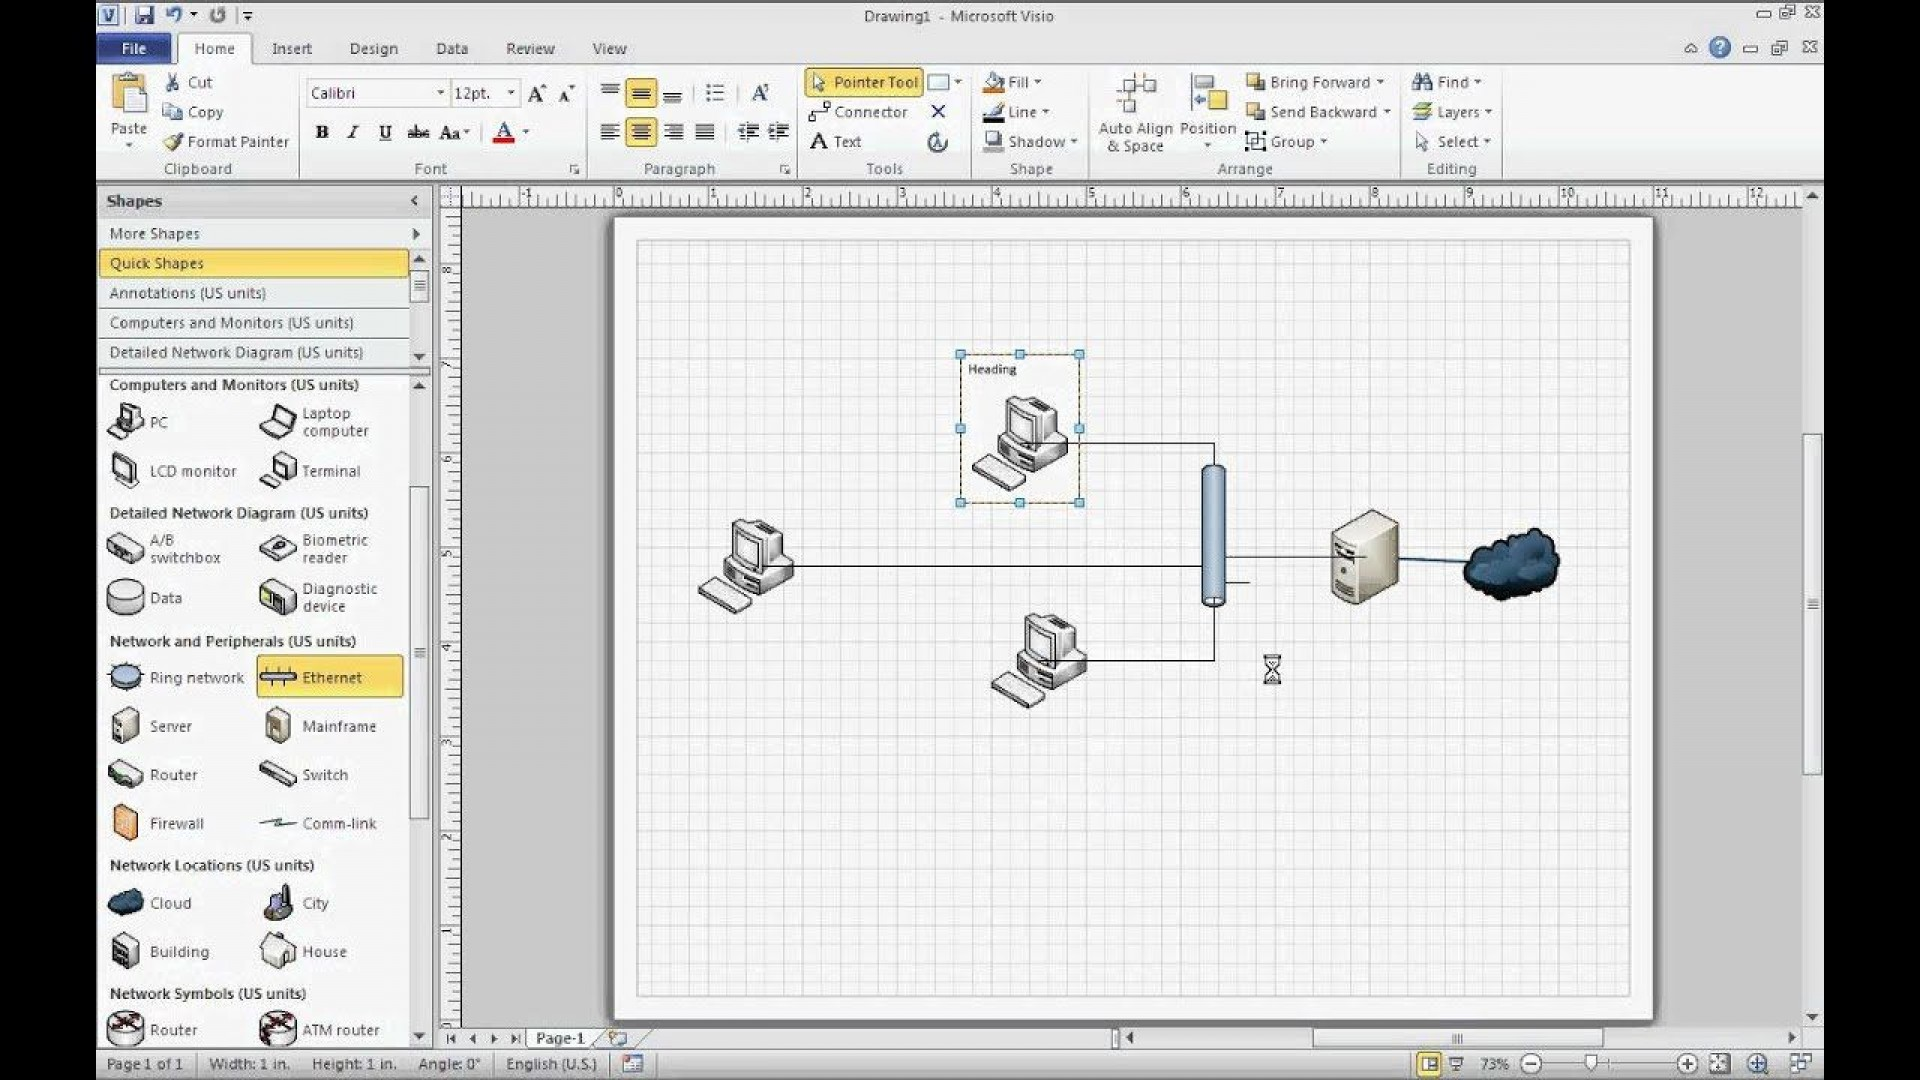 000 Awful Uml Diagram Template Visio 2010 Image  Model Download Clas1920